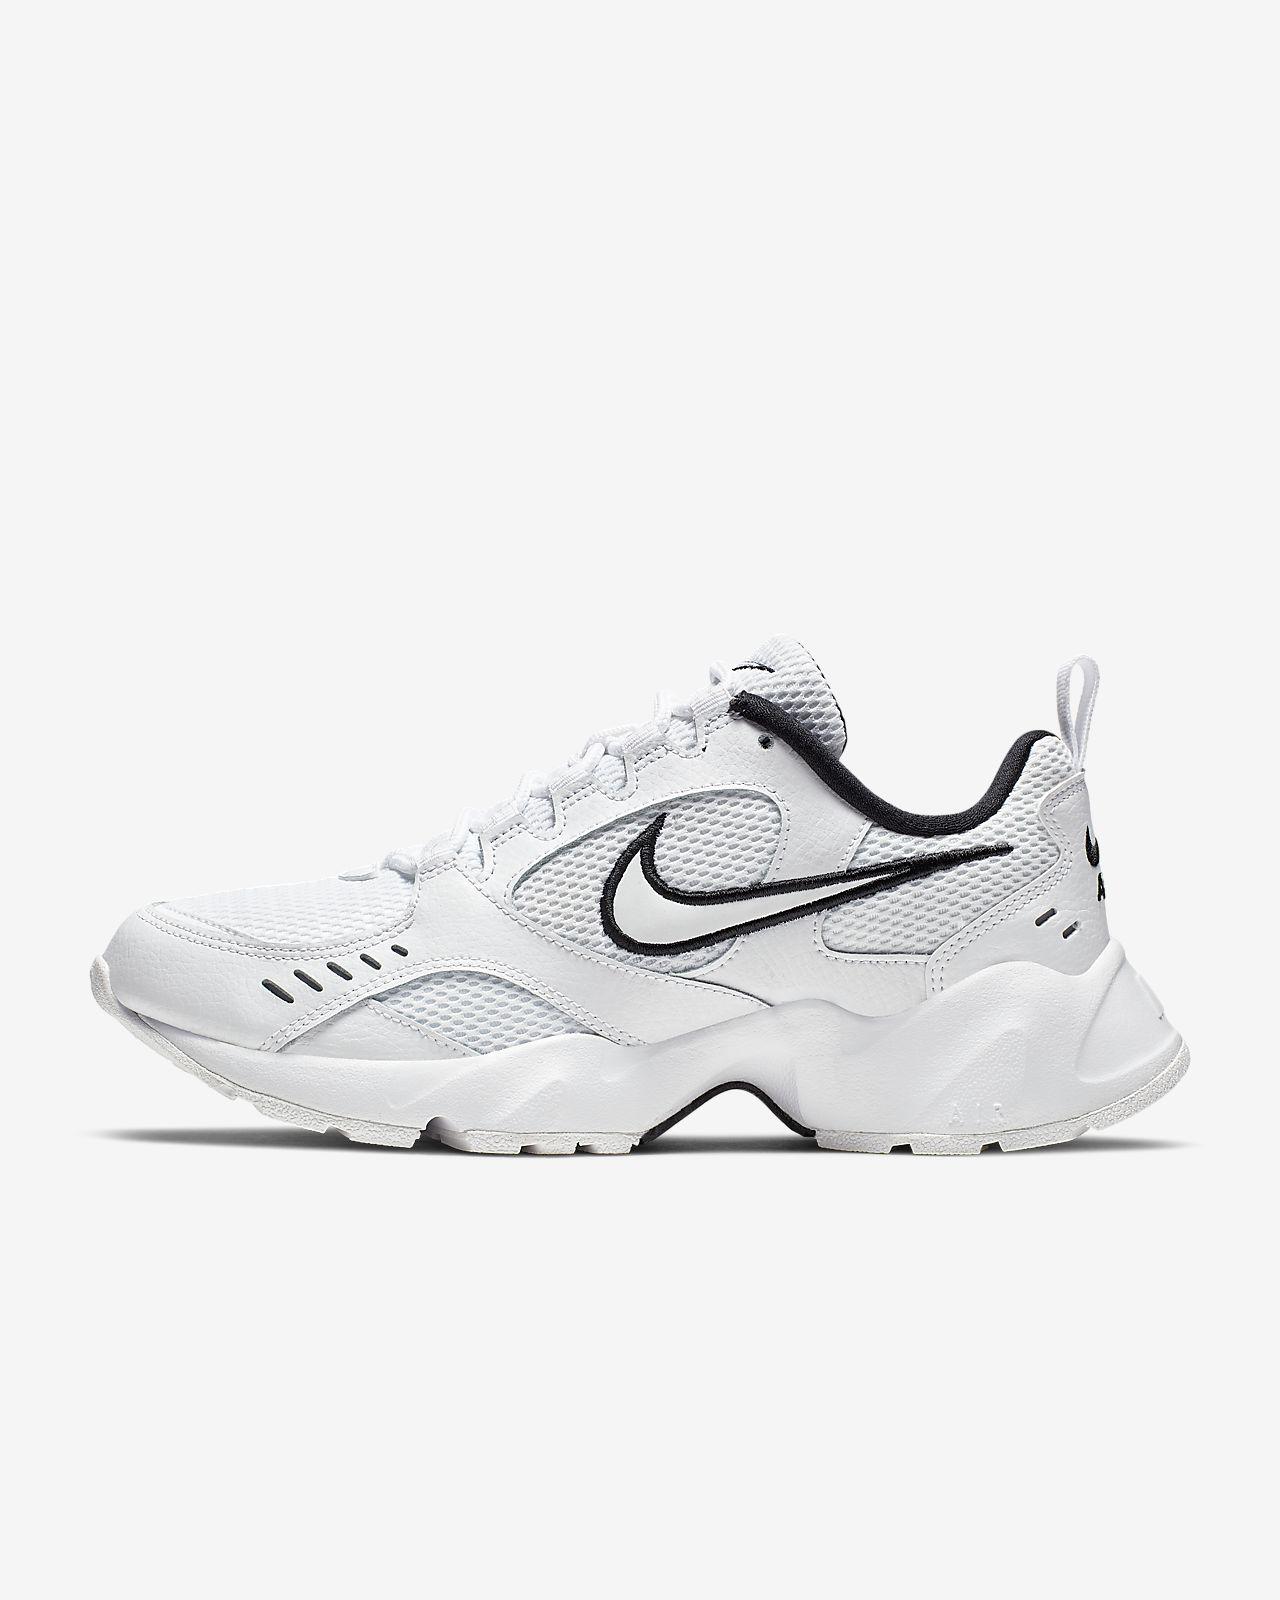 Buty Air Heights CI0603 102 WhiteWhiteBlack, kolor biały (Nike)